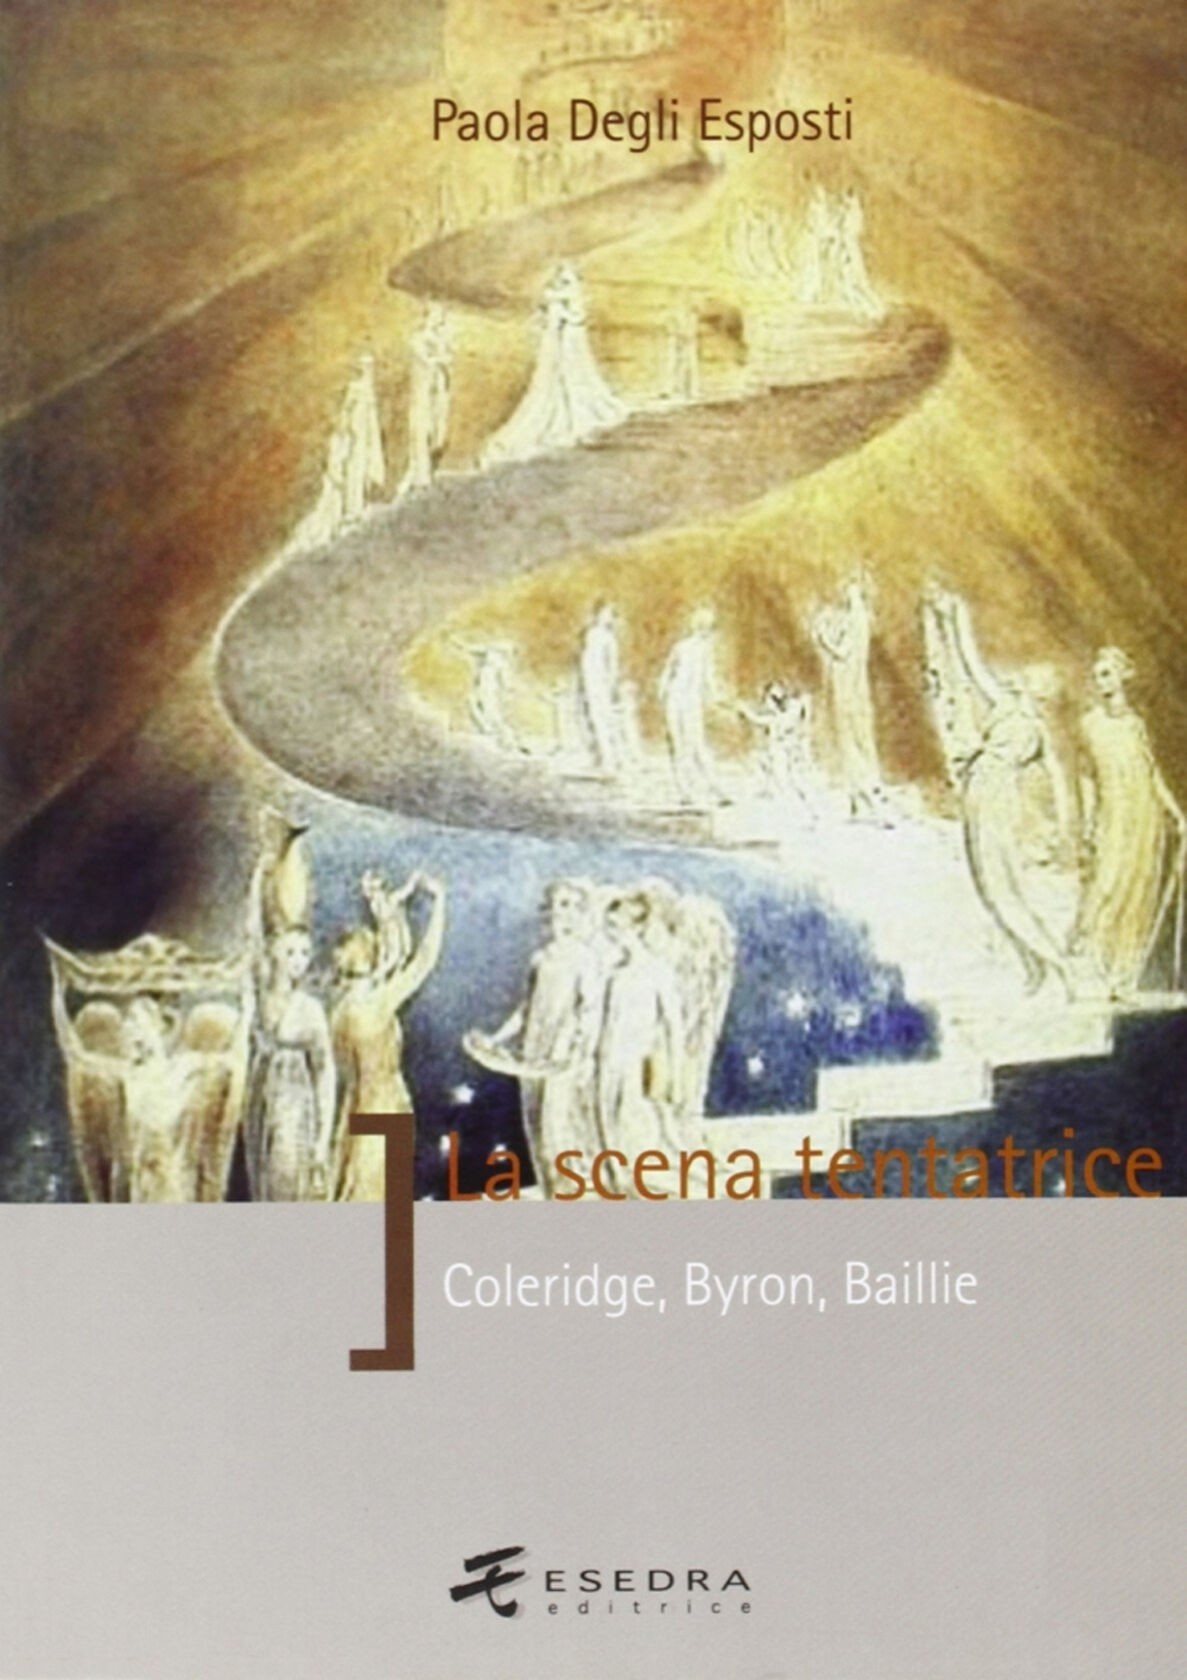 La scena tentatrice (Coleridge, Byron, Baillie)